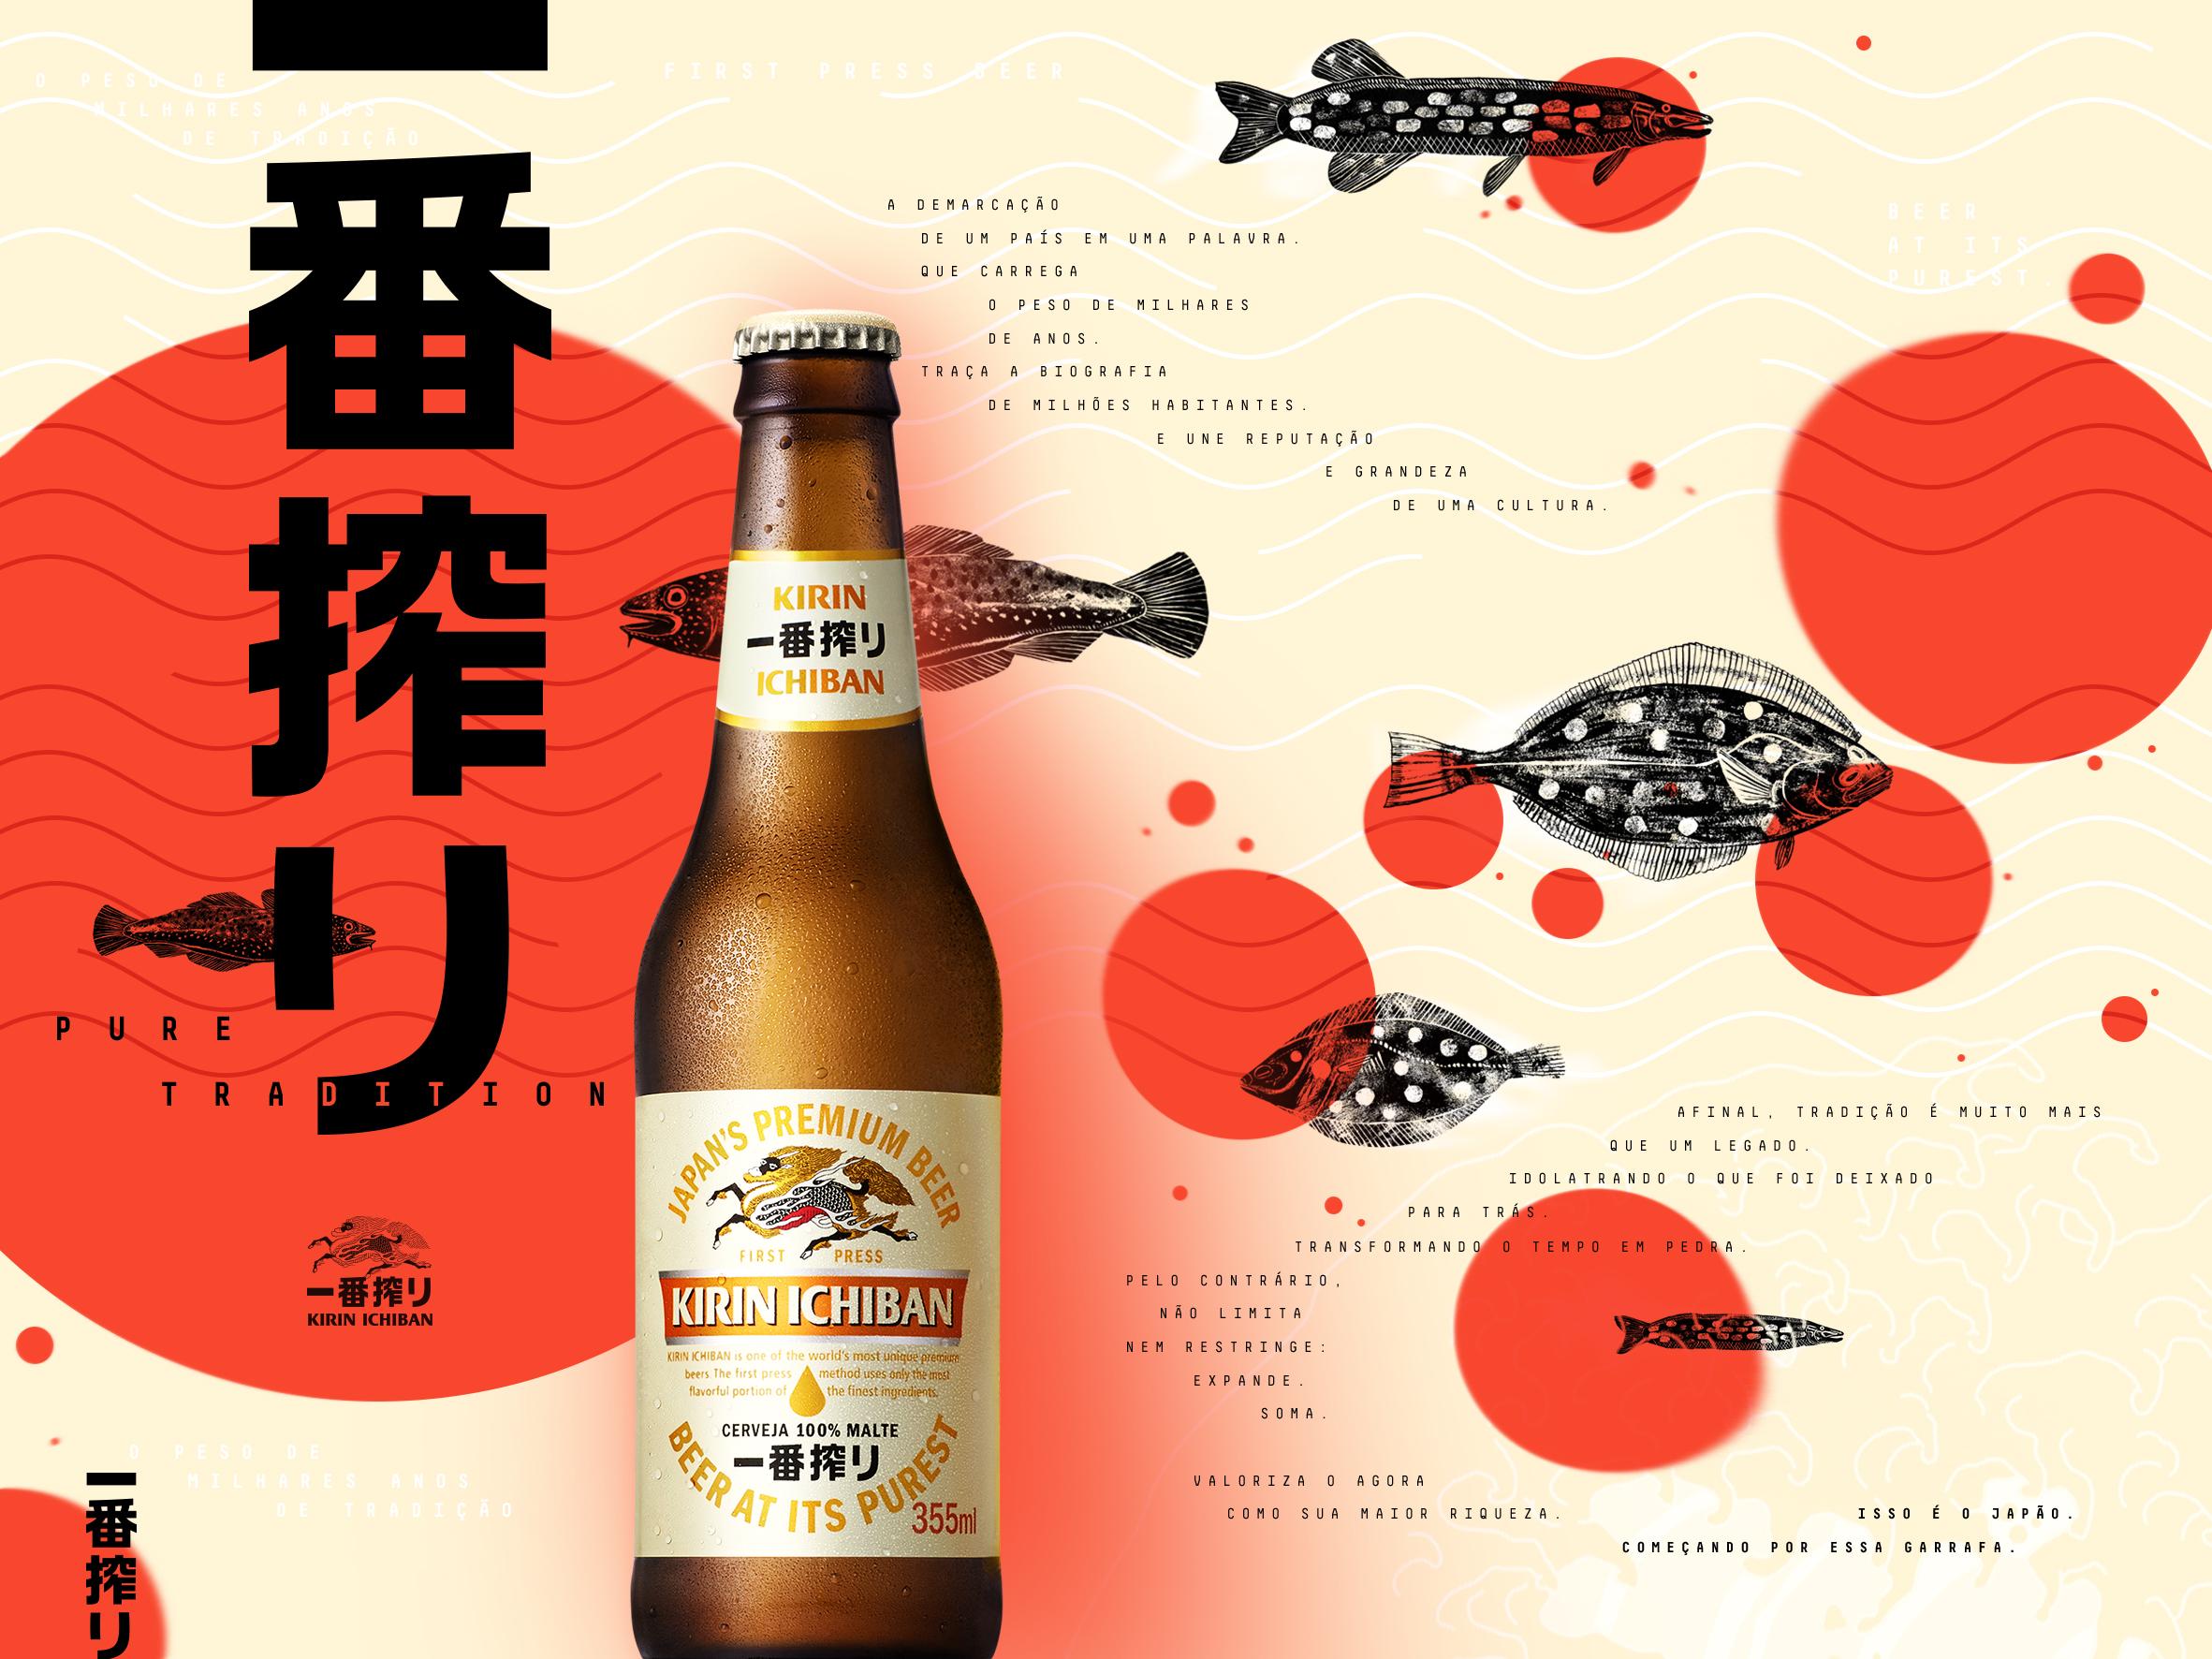 Ichiban-1-Tradition